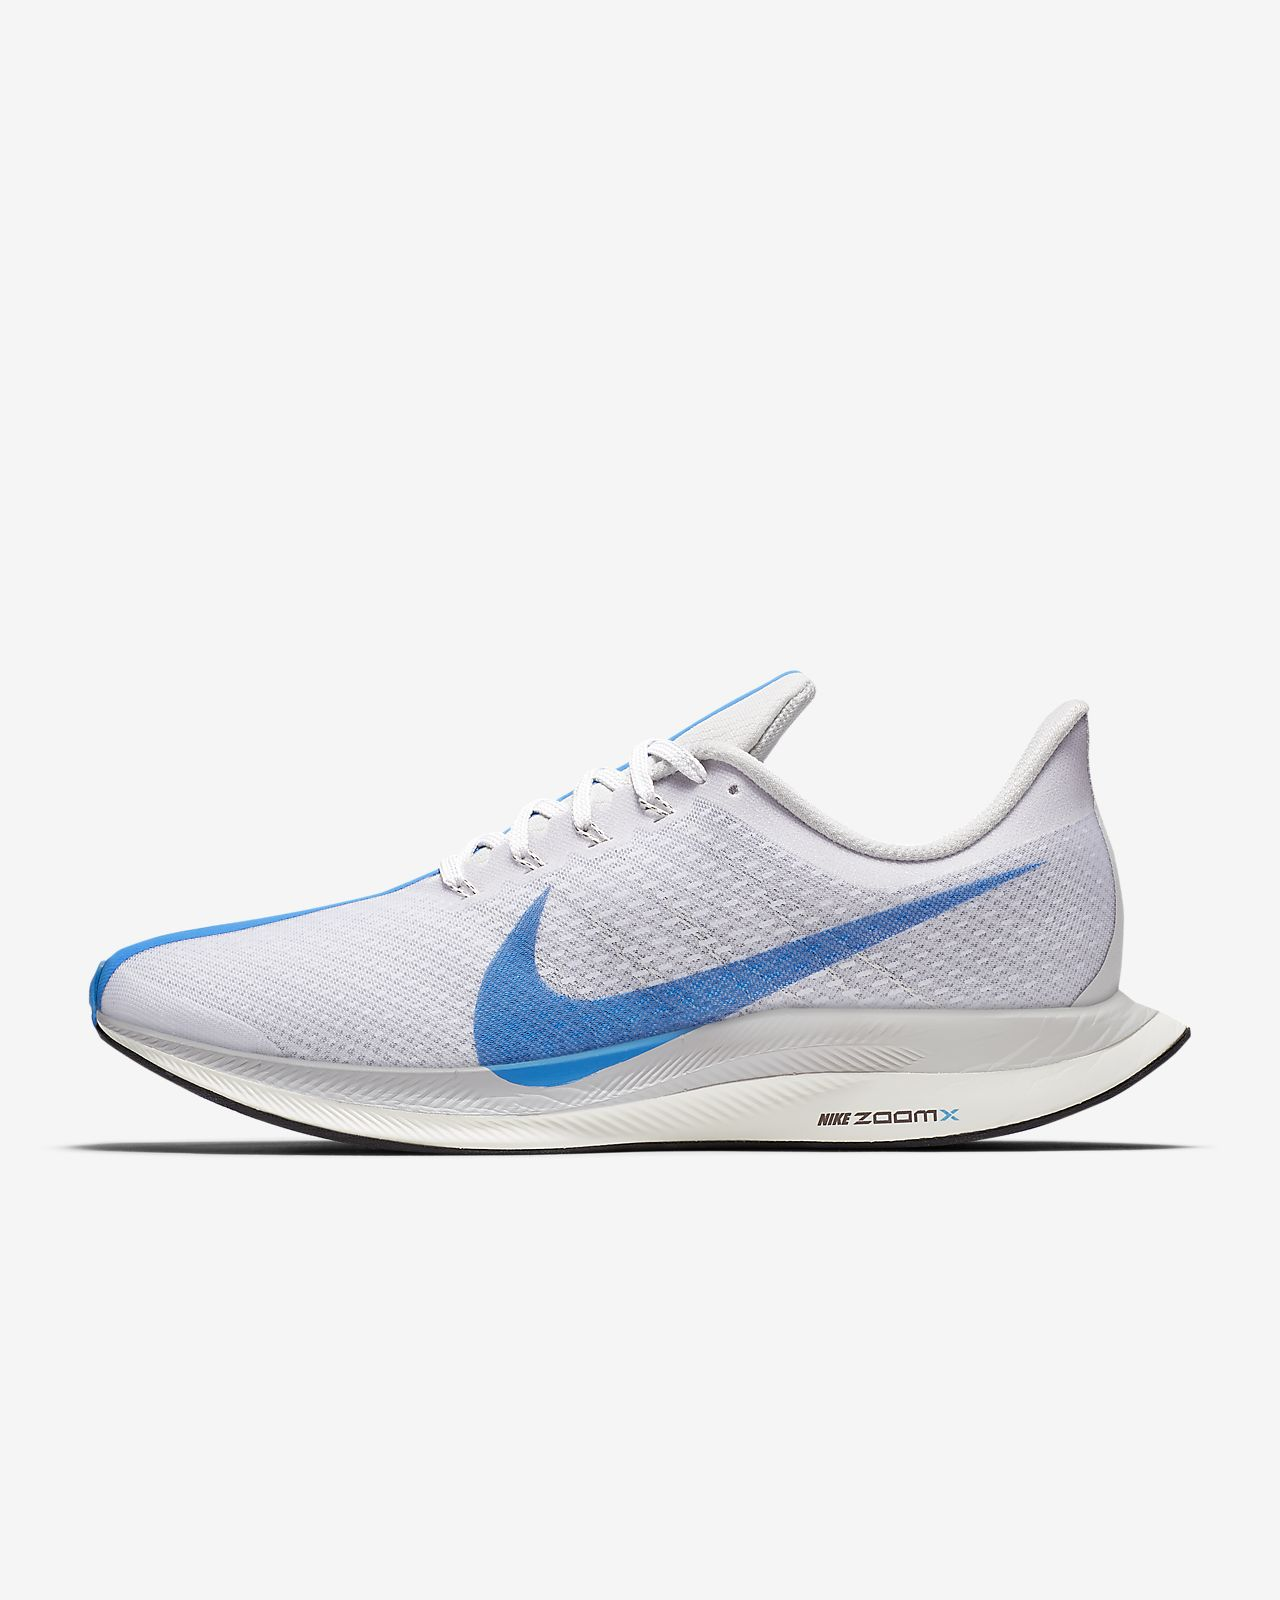 Nike Zoom Pegasus 35 Turbo 男款跑鞋